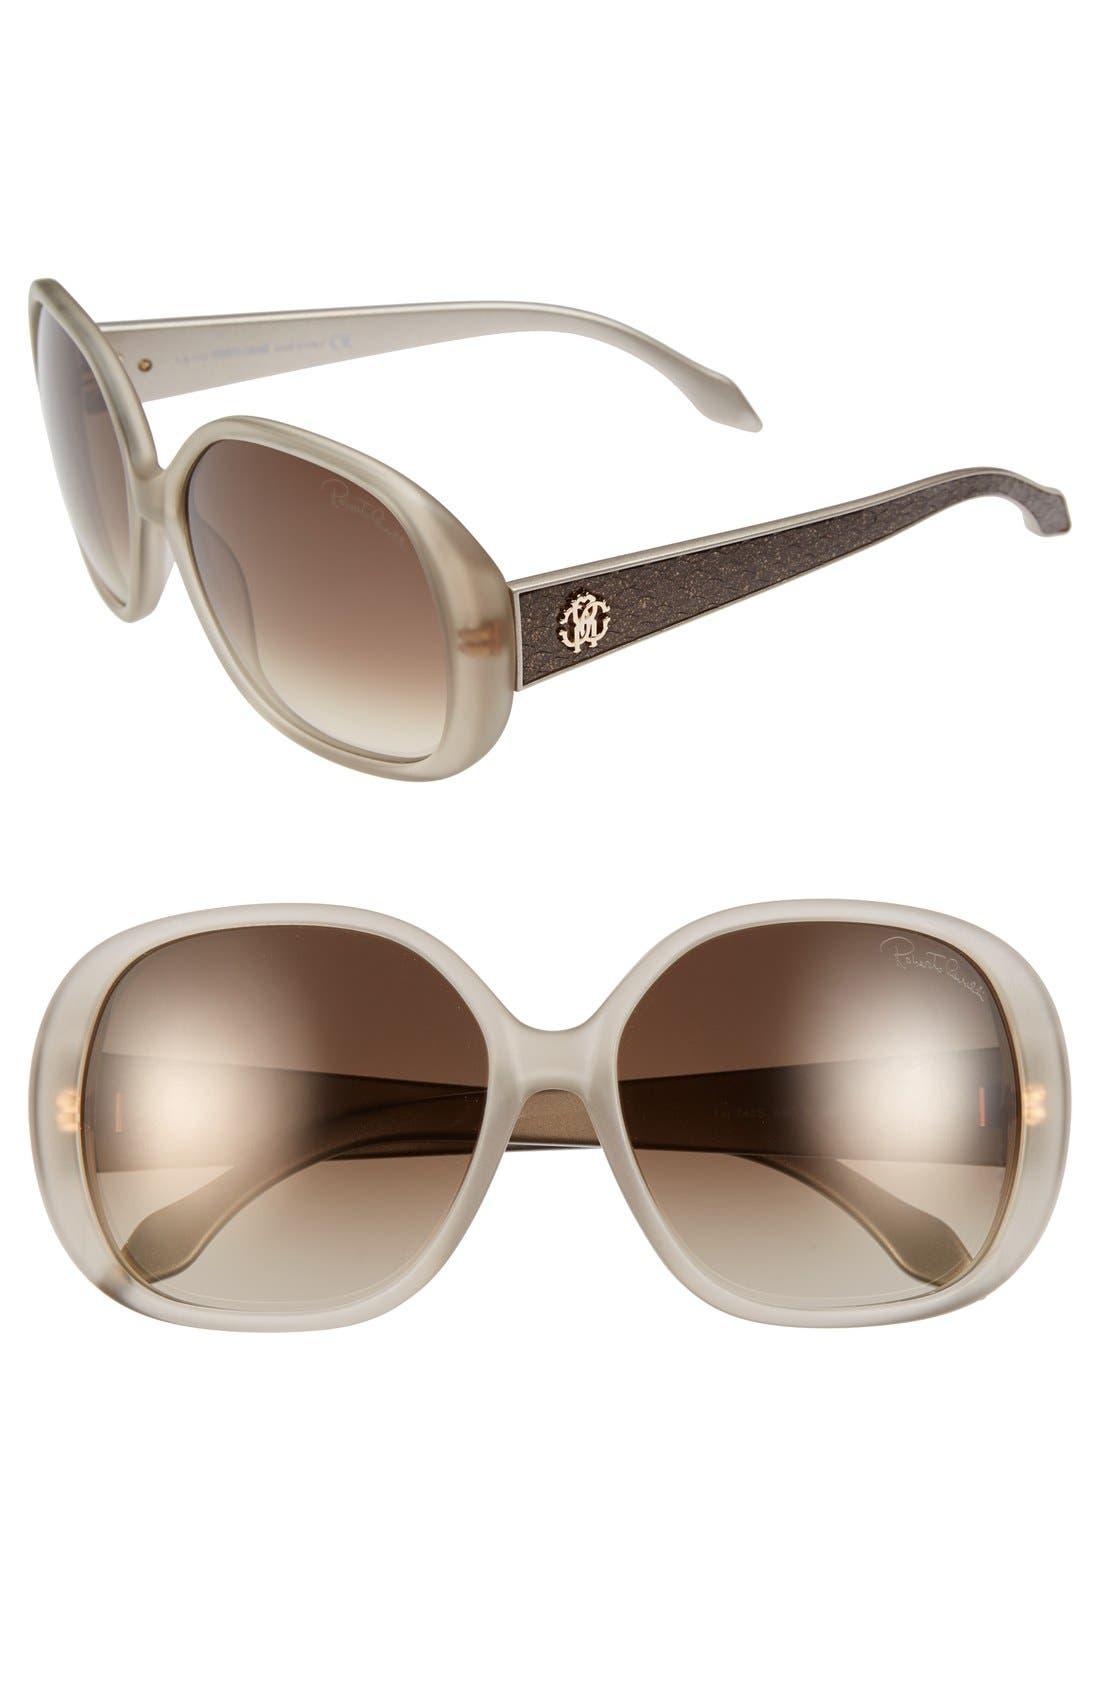 Main Image - Roberto Cavalli 'Taj' 60mm Sunglasses